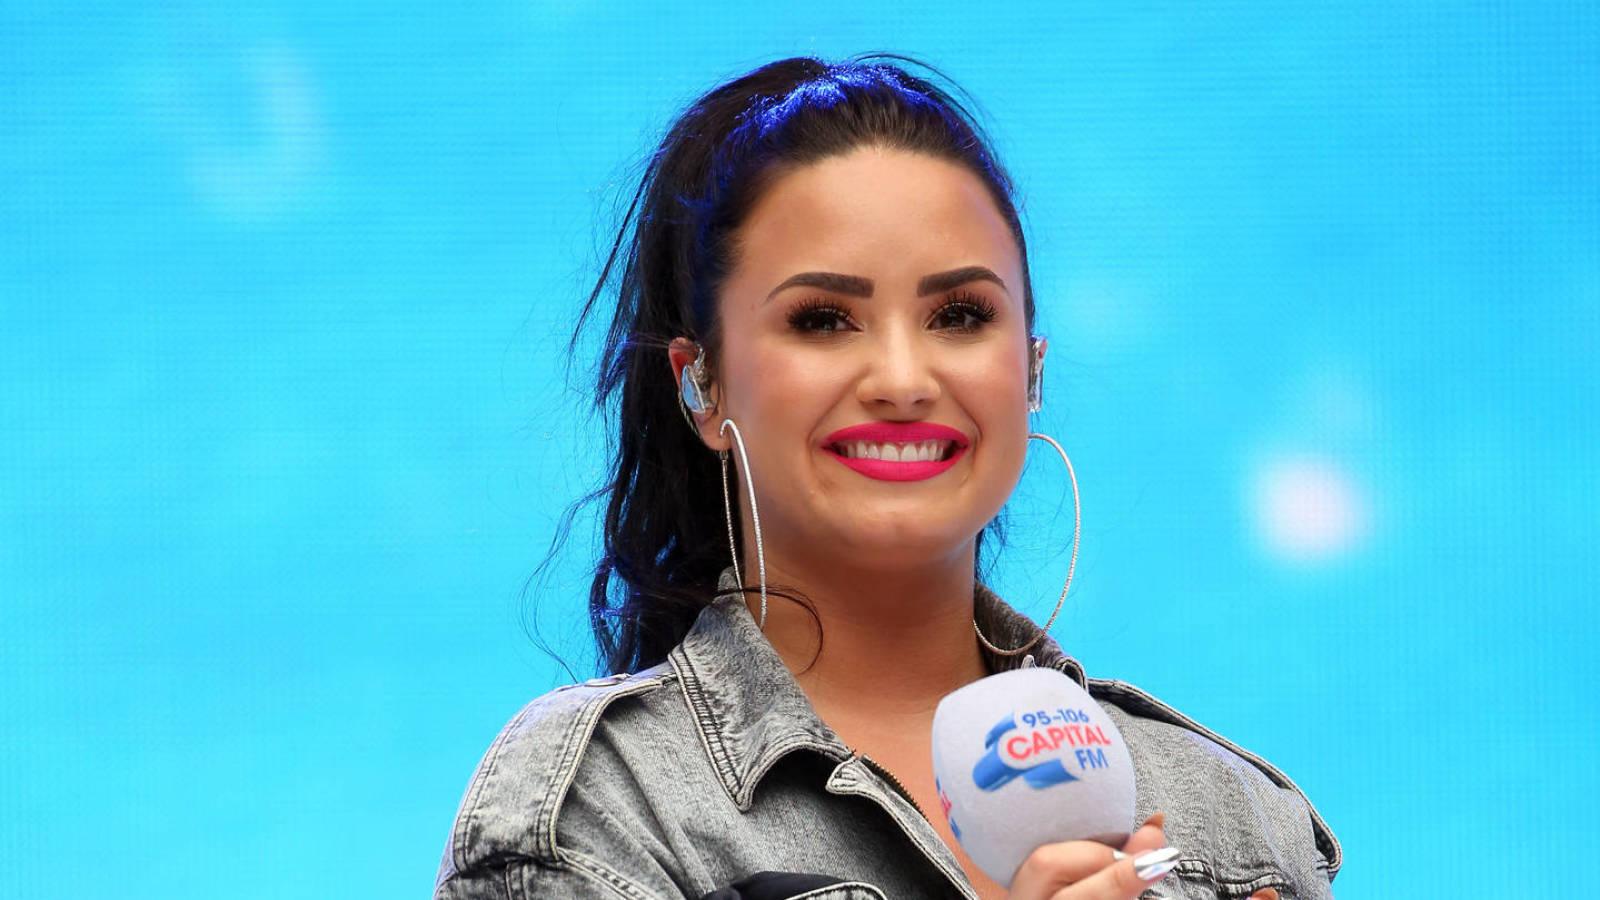 www.yardbarker.com: Demi Lovato launching her own podcast